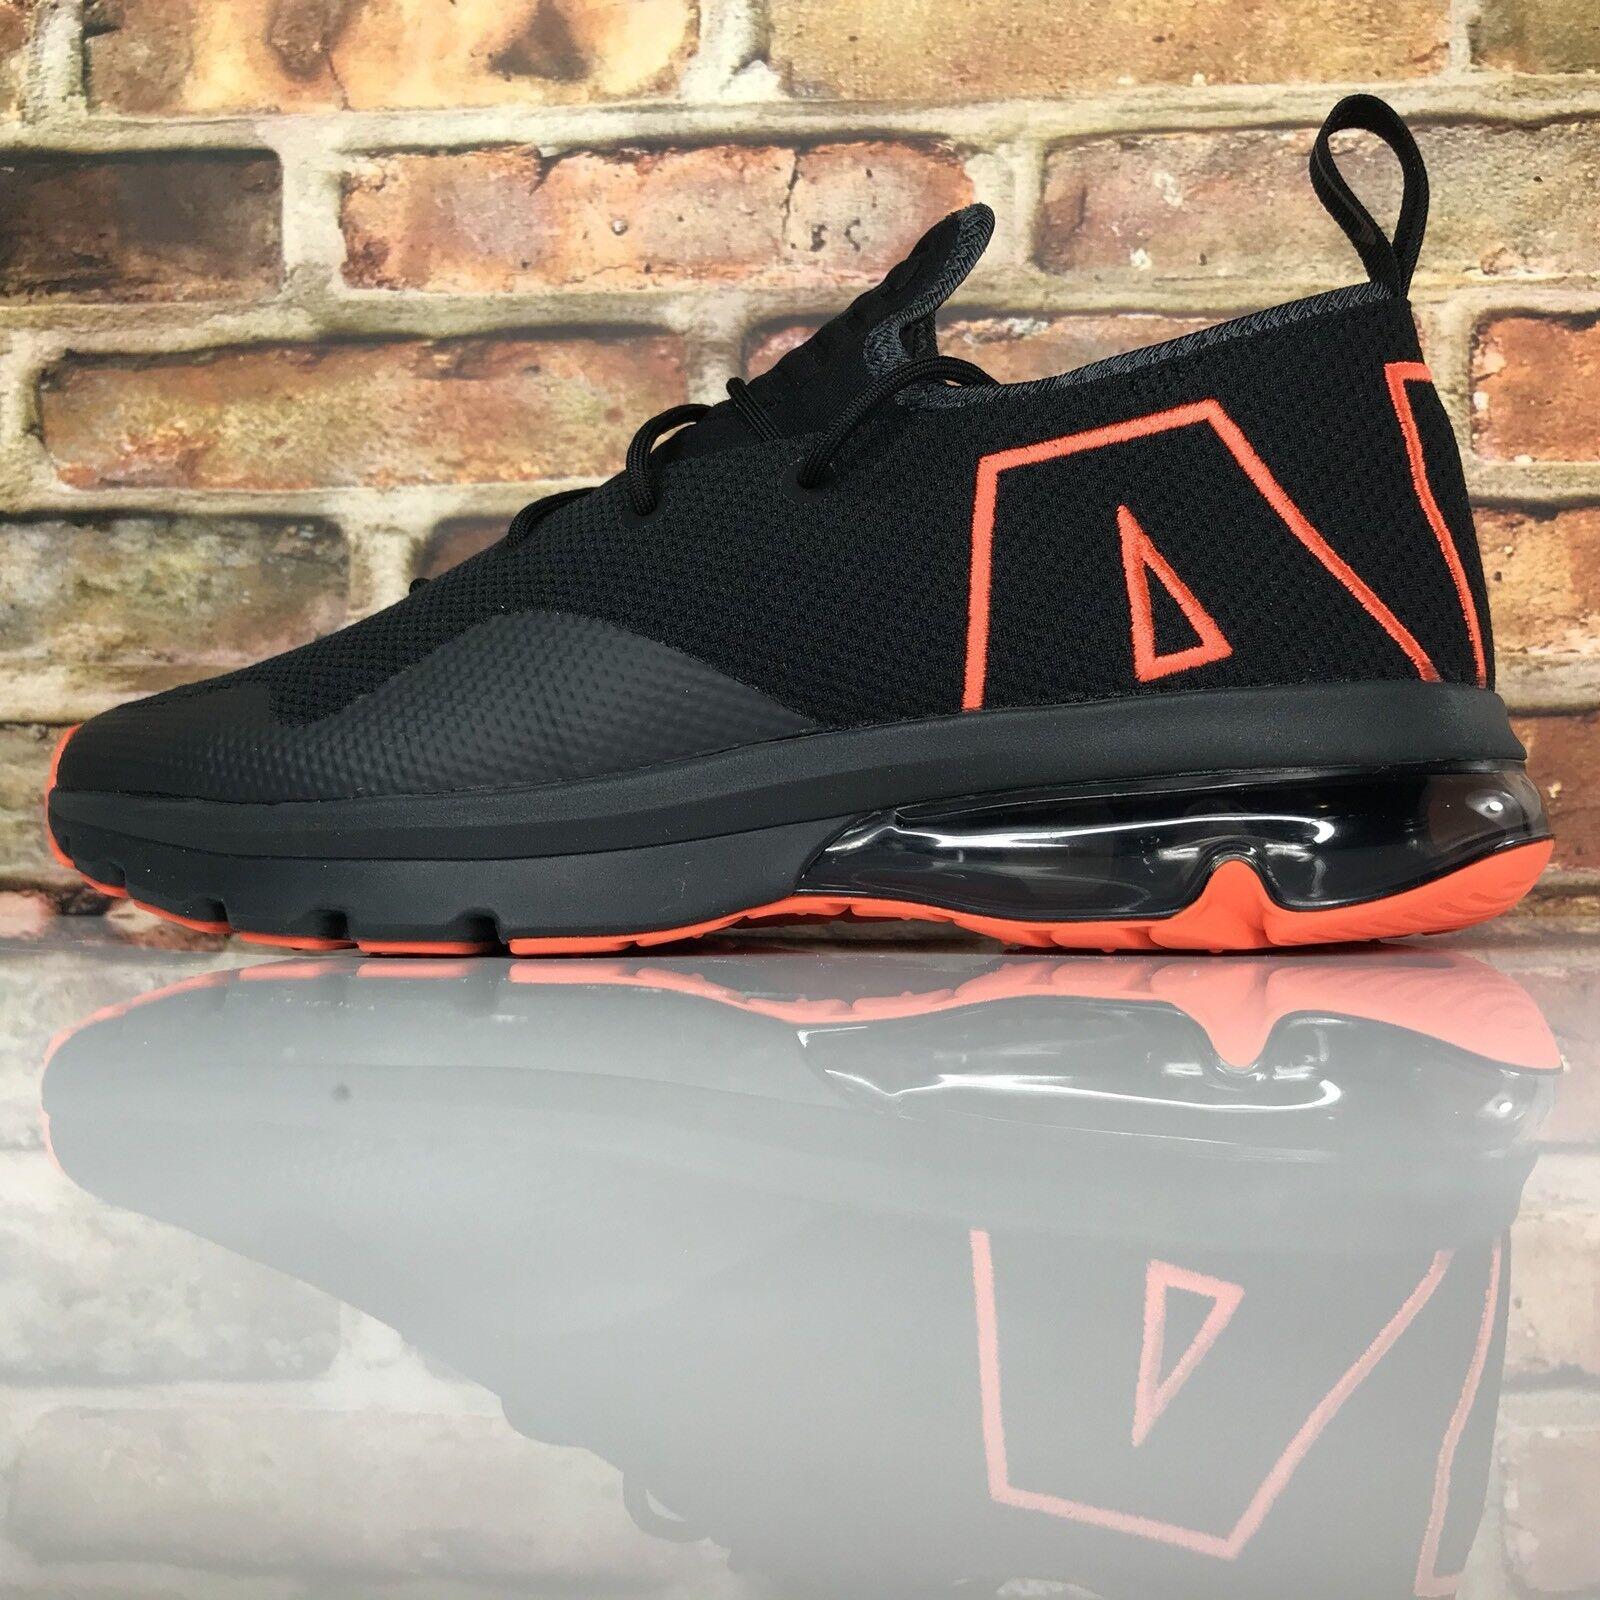 Nike air Uomo max stile 50 p Uomo air 43 di scarpe da corsa ah9949-001 nero arancione 6b7b15